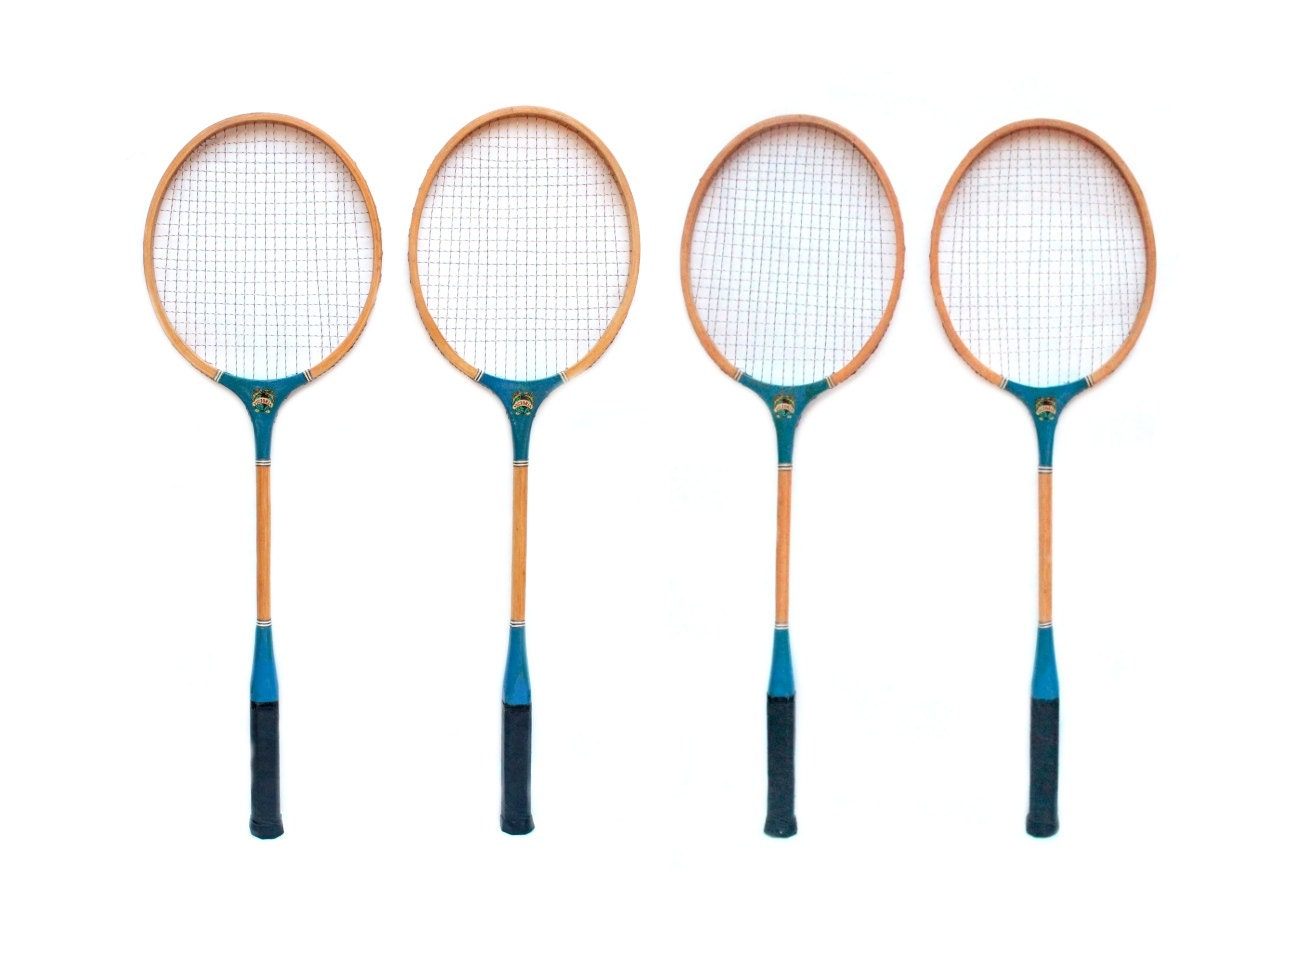 Set Of 4 Vintage Victoria Wooden Badminton Rackets